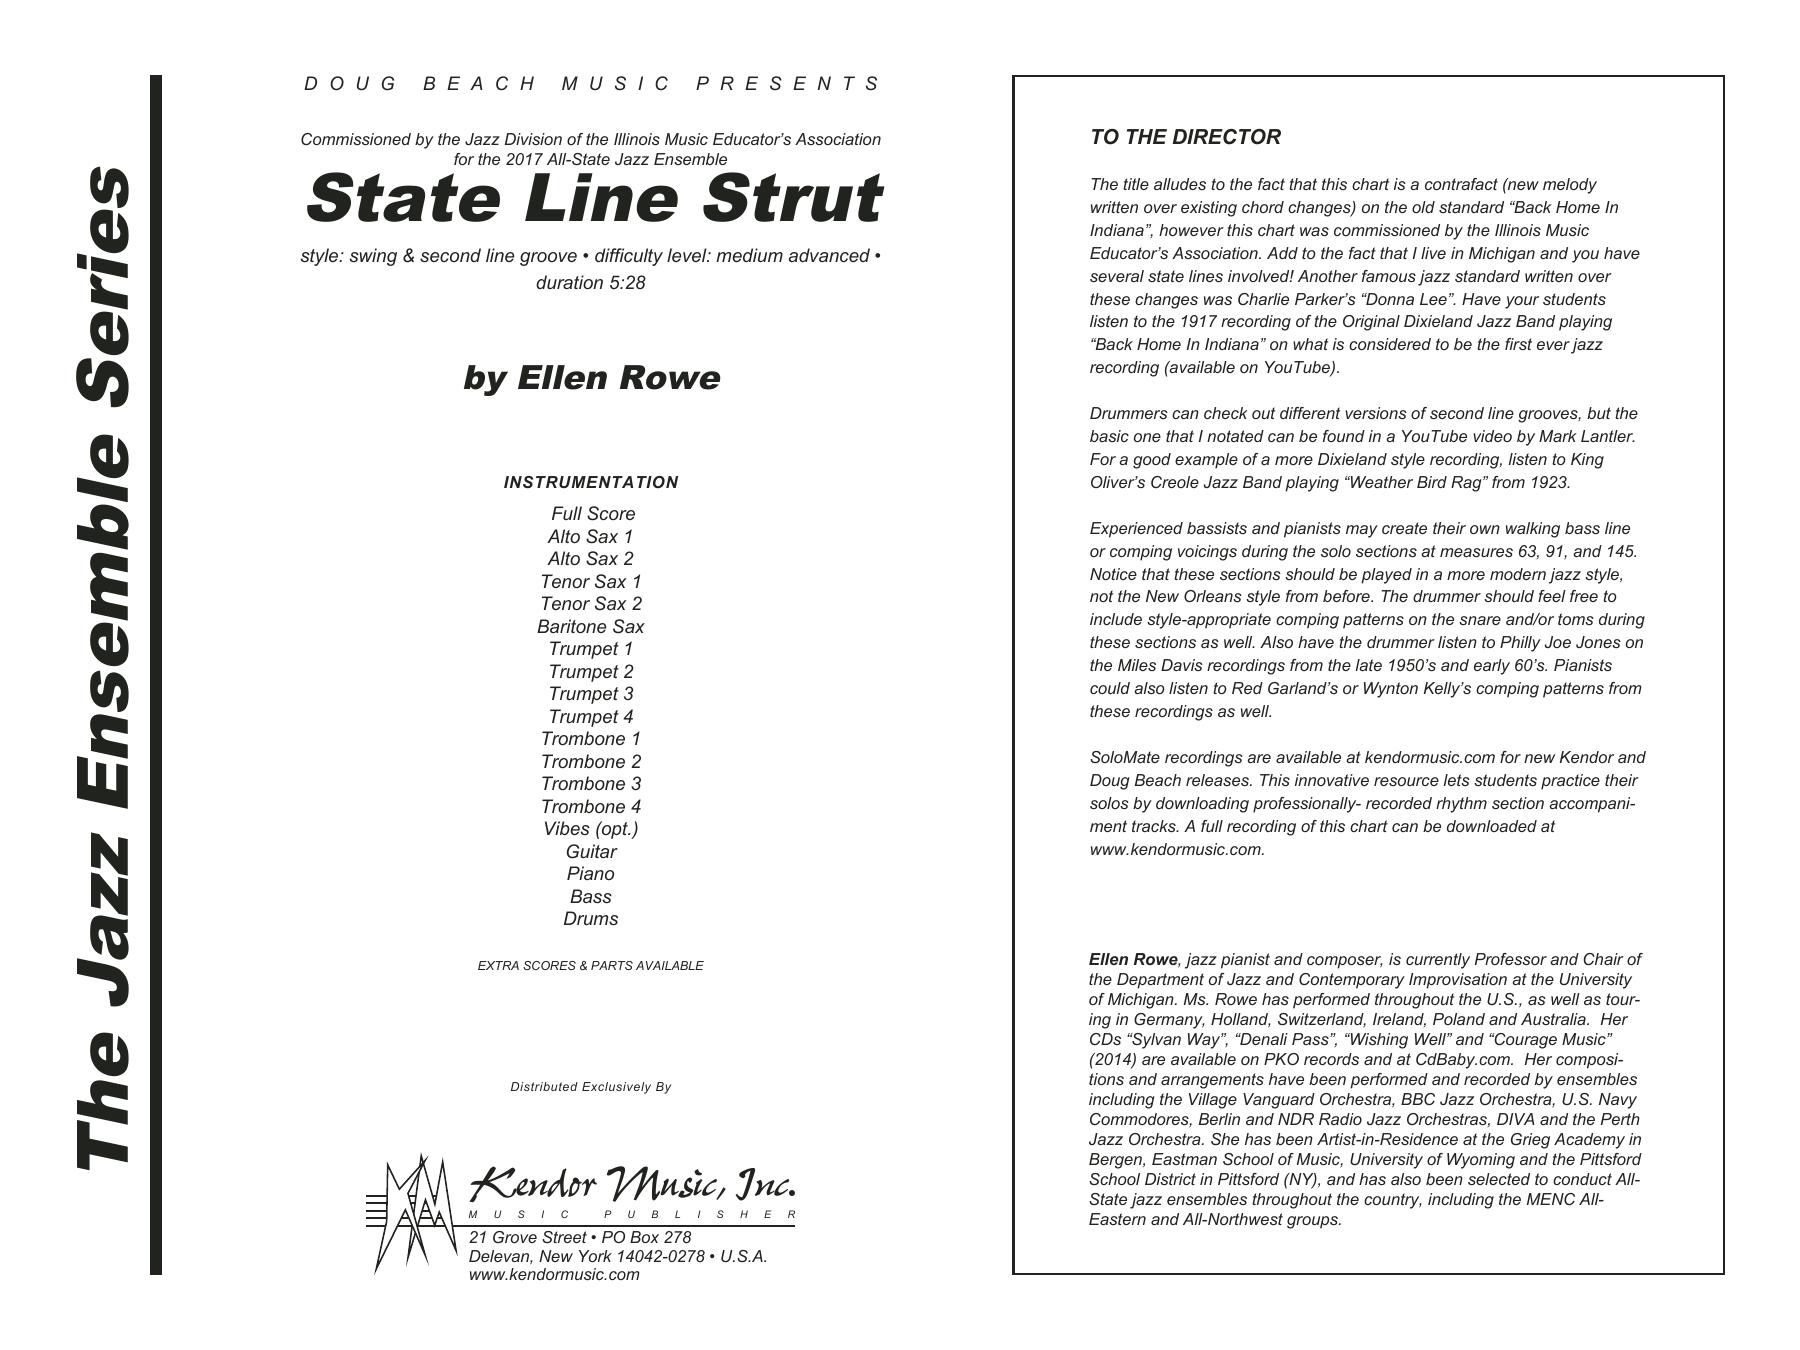 State Line Strut - Full Score Sheet Music